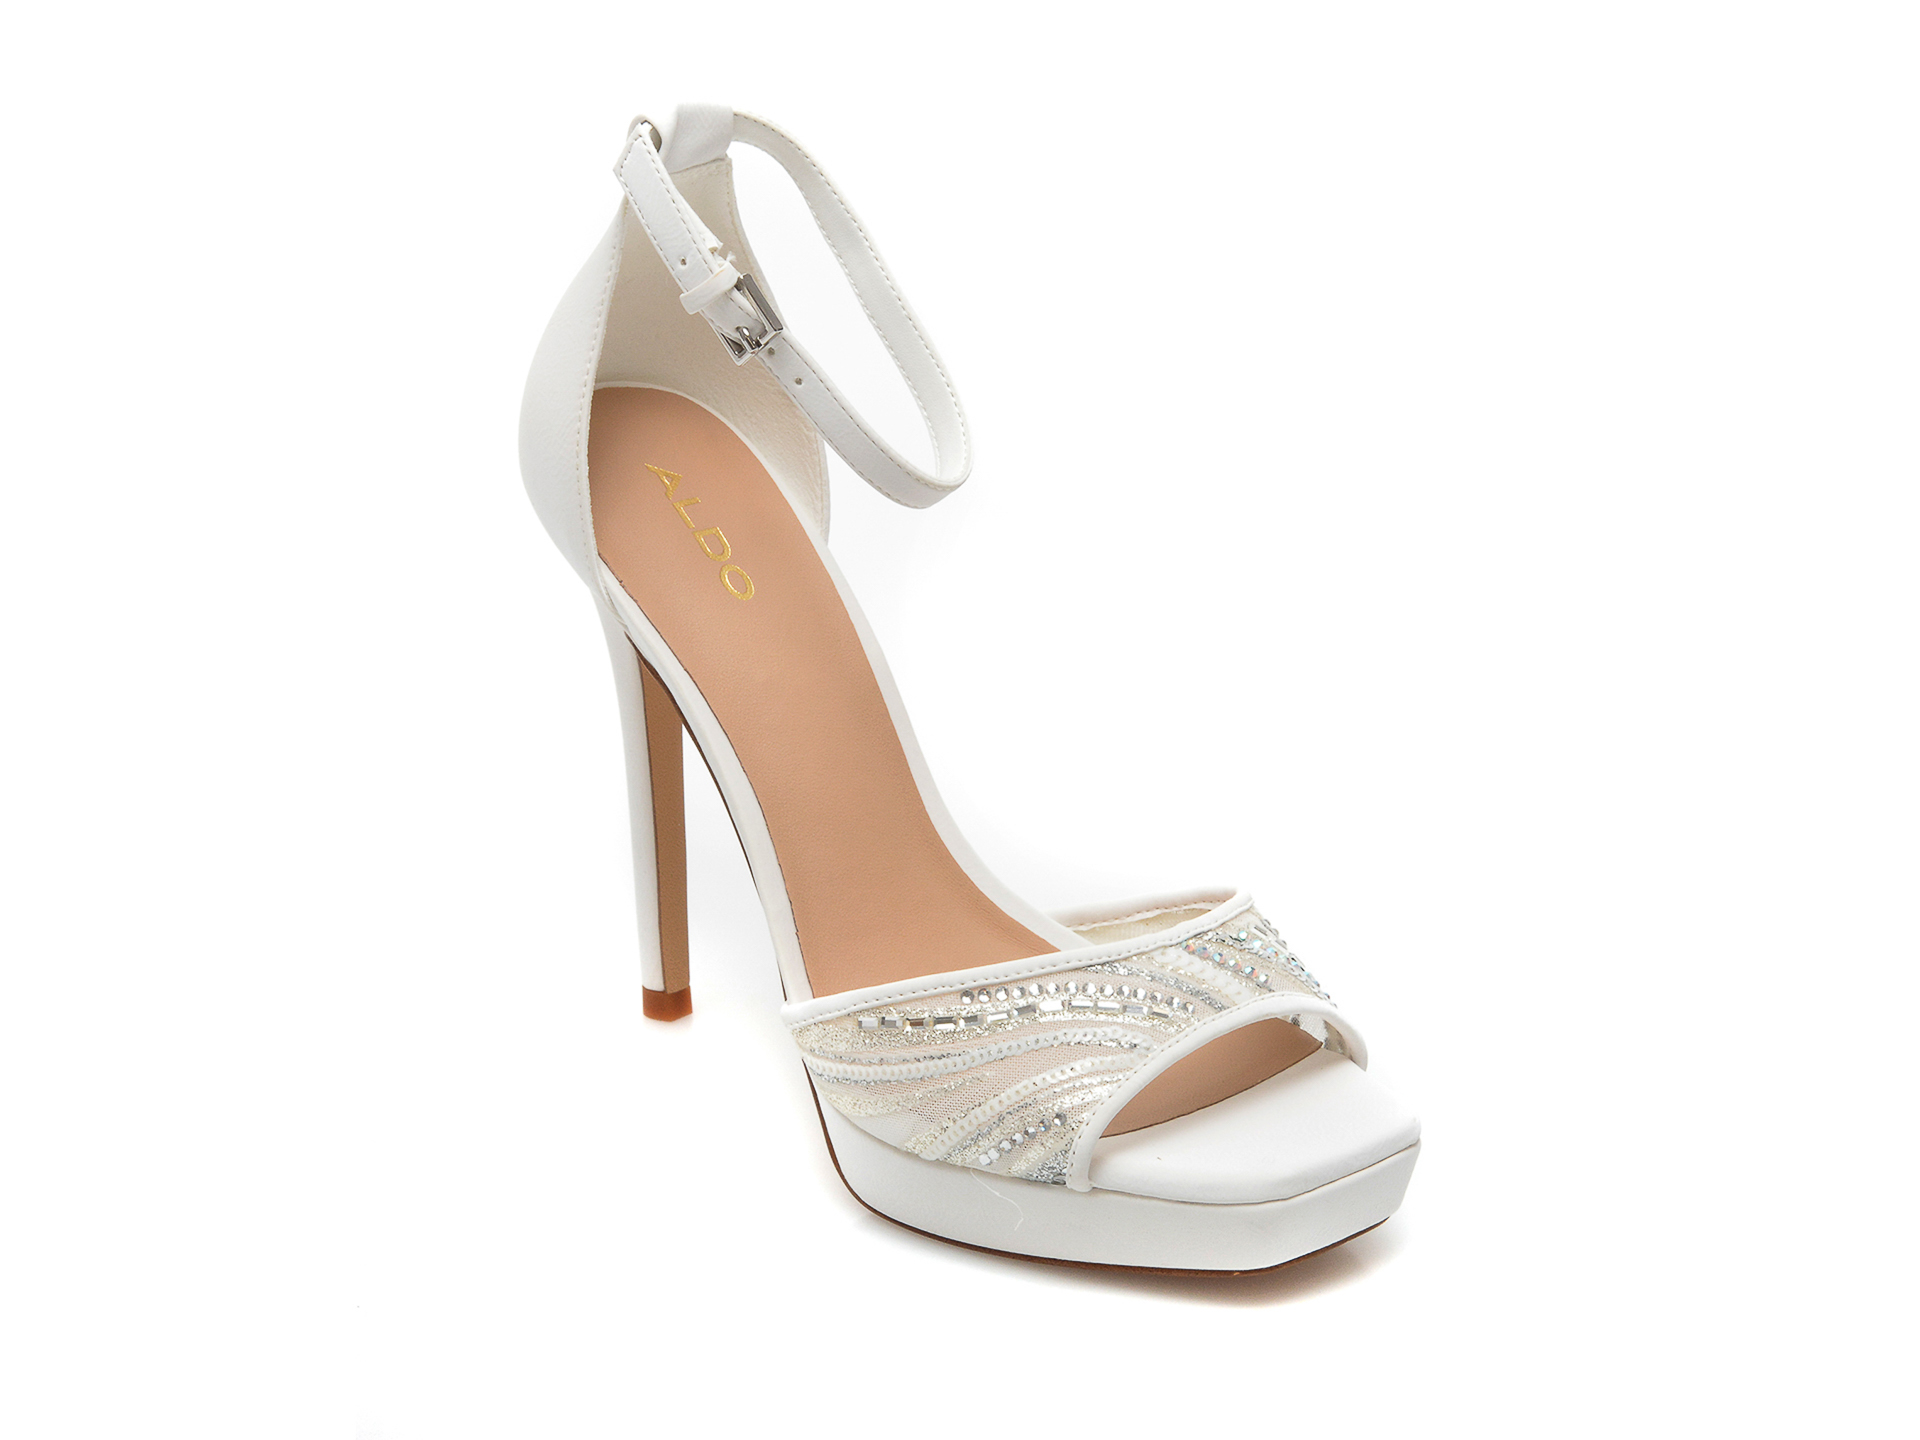 Sandale ALDO albe, Wicoethiel100, din material textil si piele ecologica imagine otter.ro 2021